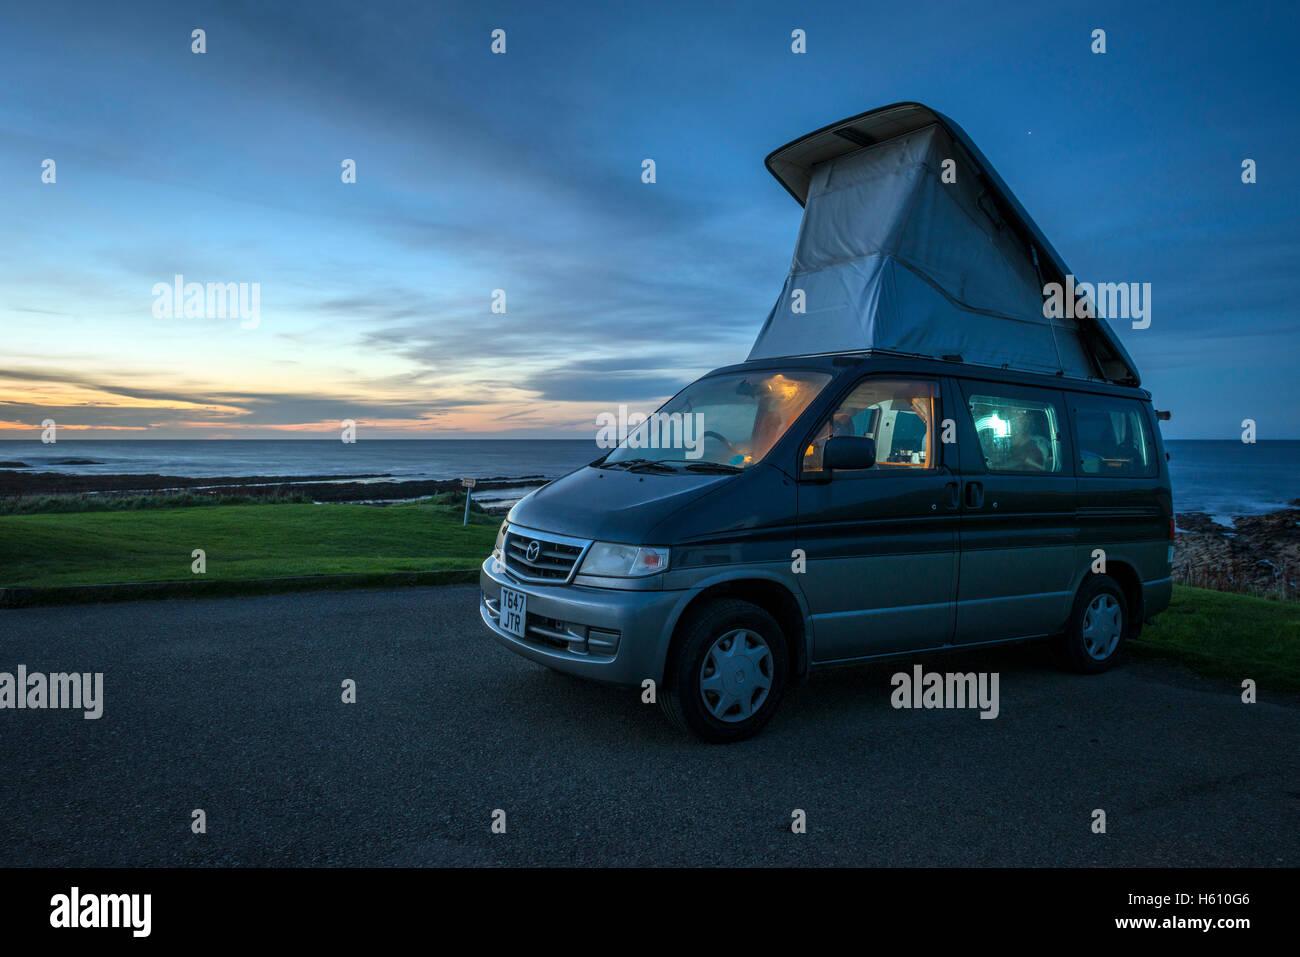 mazda bongo camper van with pop up roof camping next to. Black Bedroom Furniture Sets. Home Design Ideas